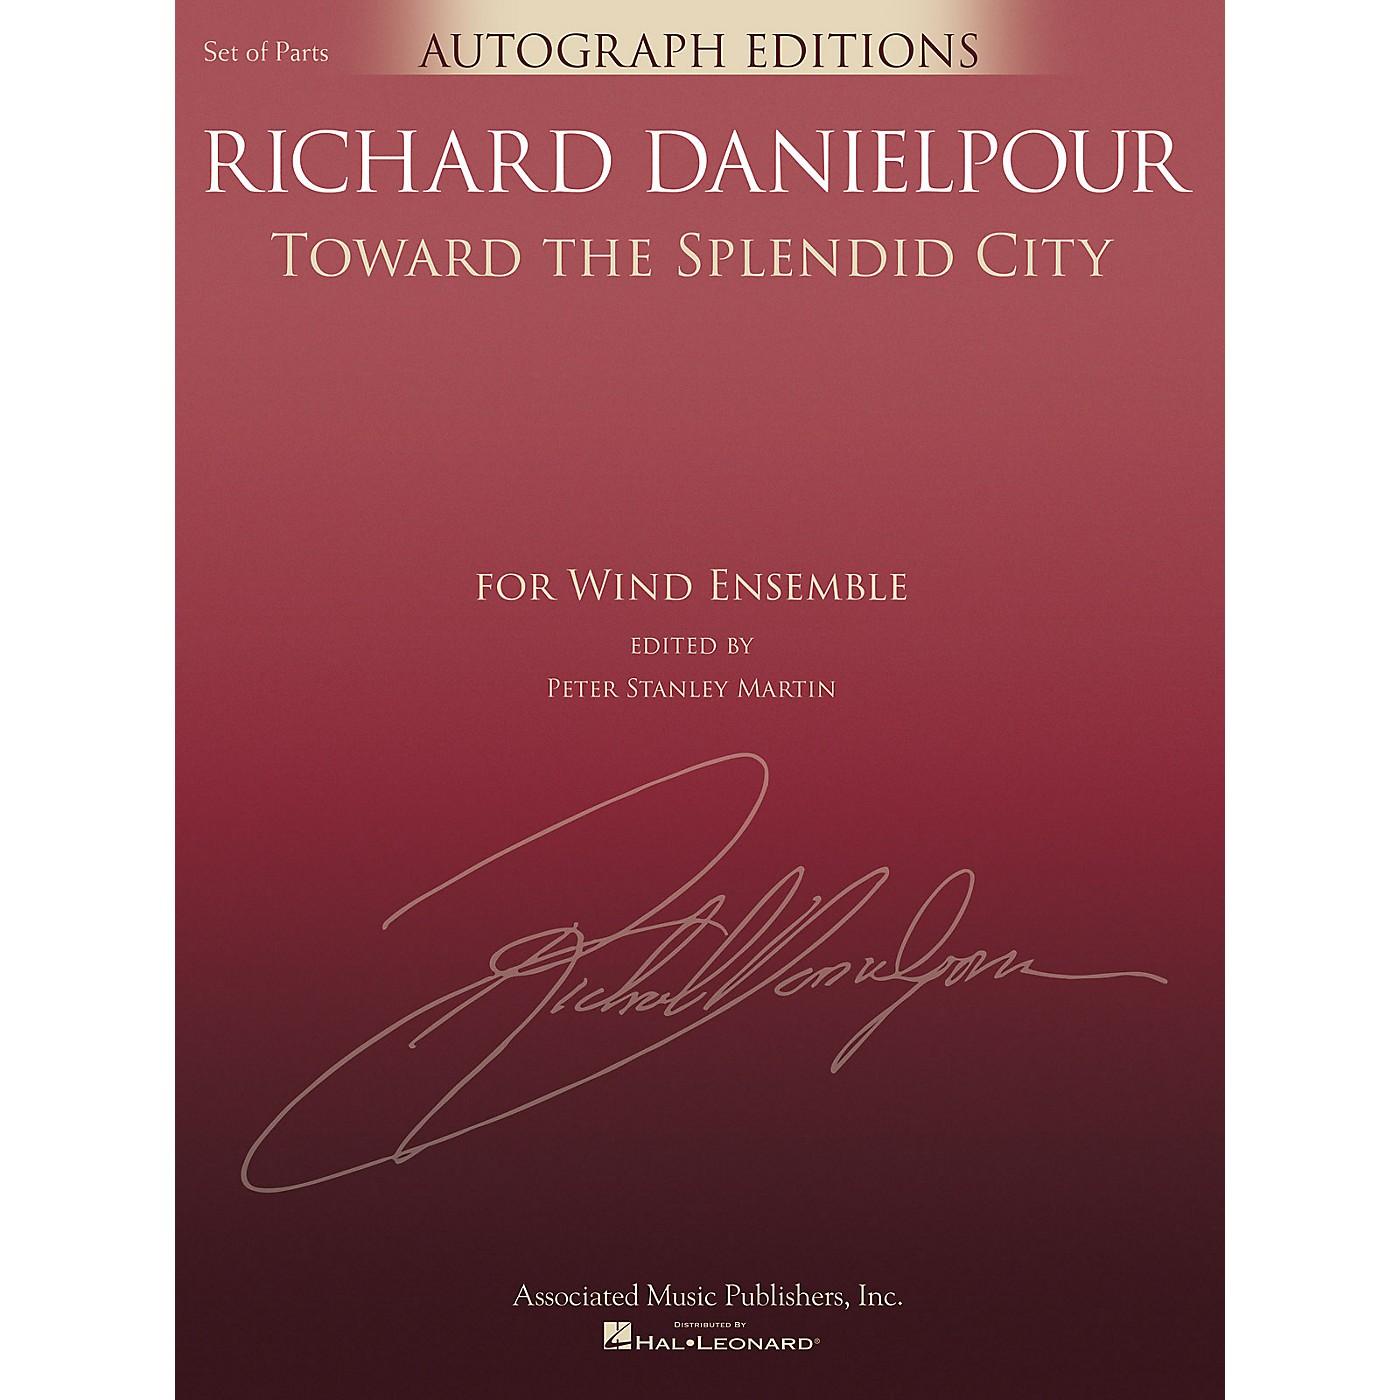 G. Schirmer Toward the Splendid City Concert Band Level 5 composed by Richard Danielpour thumbnail